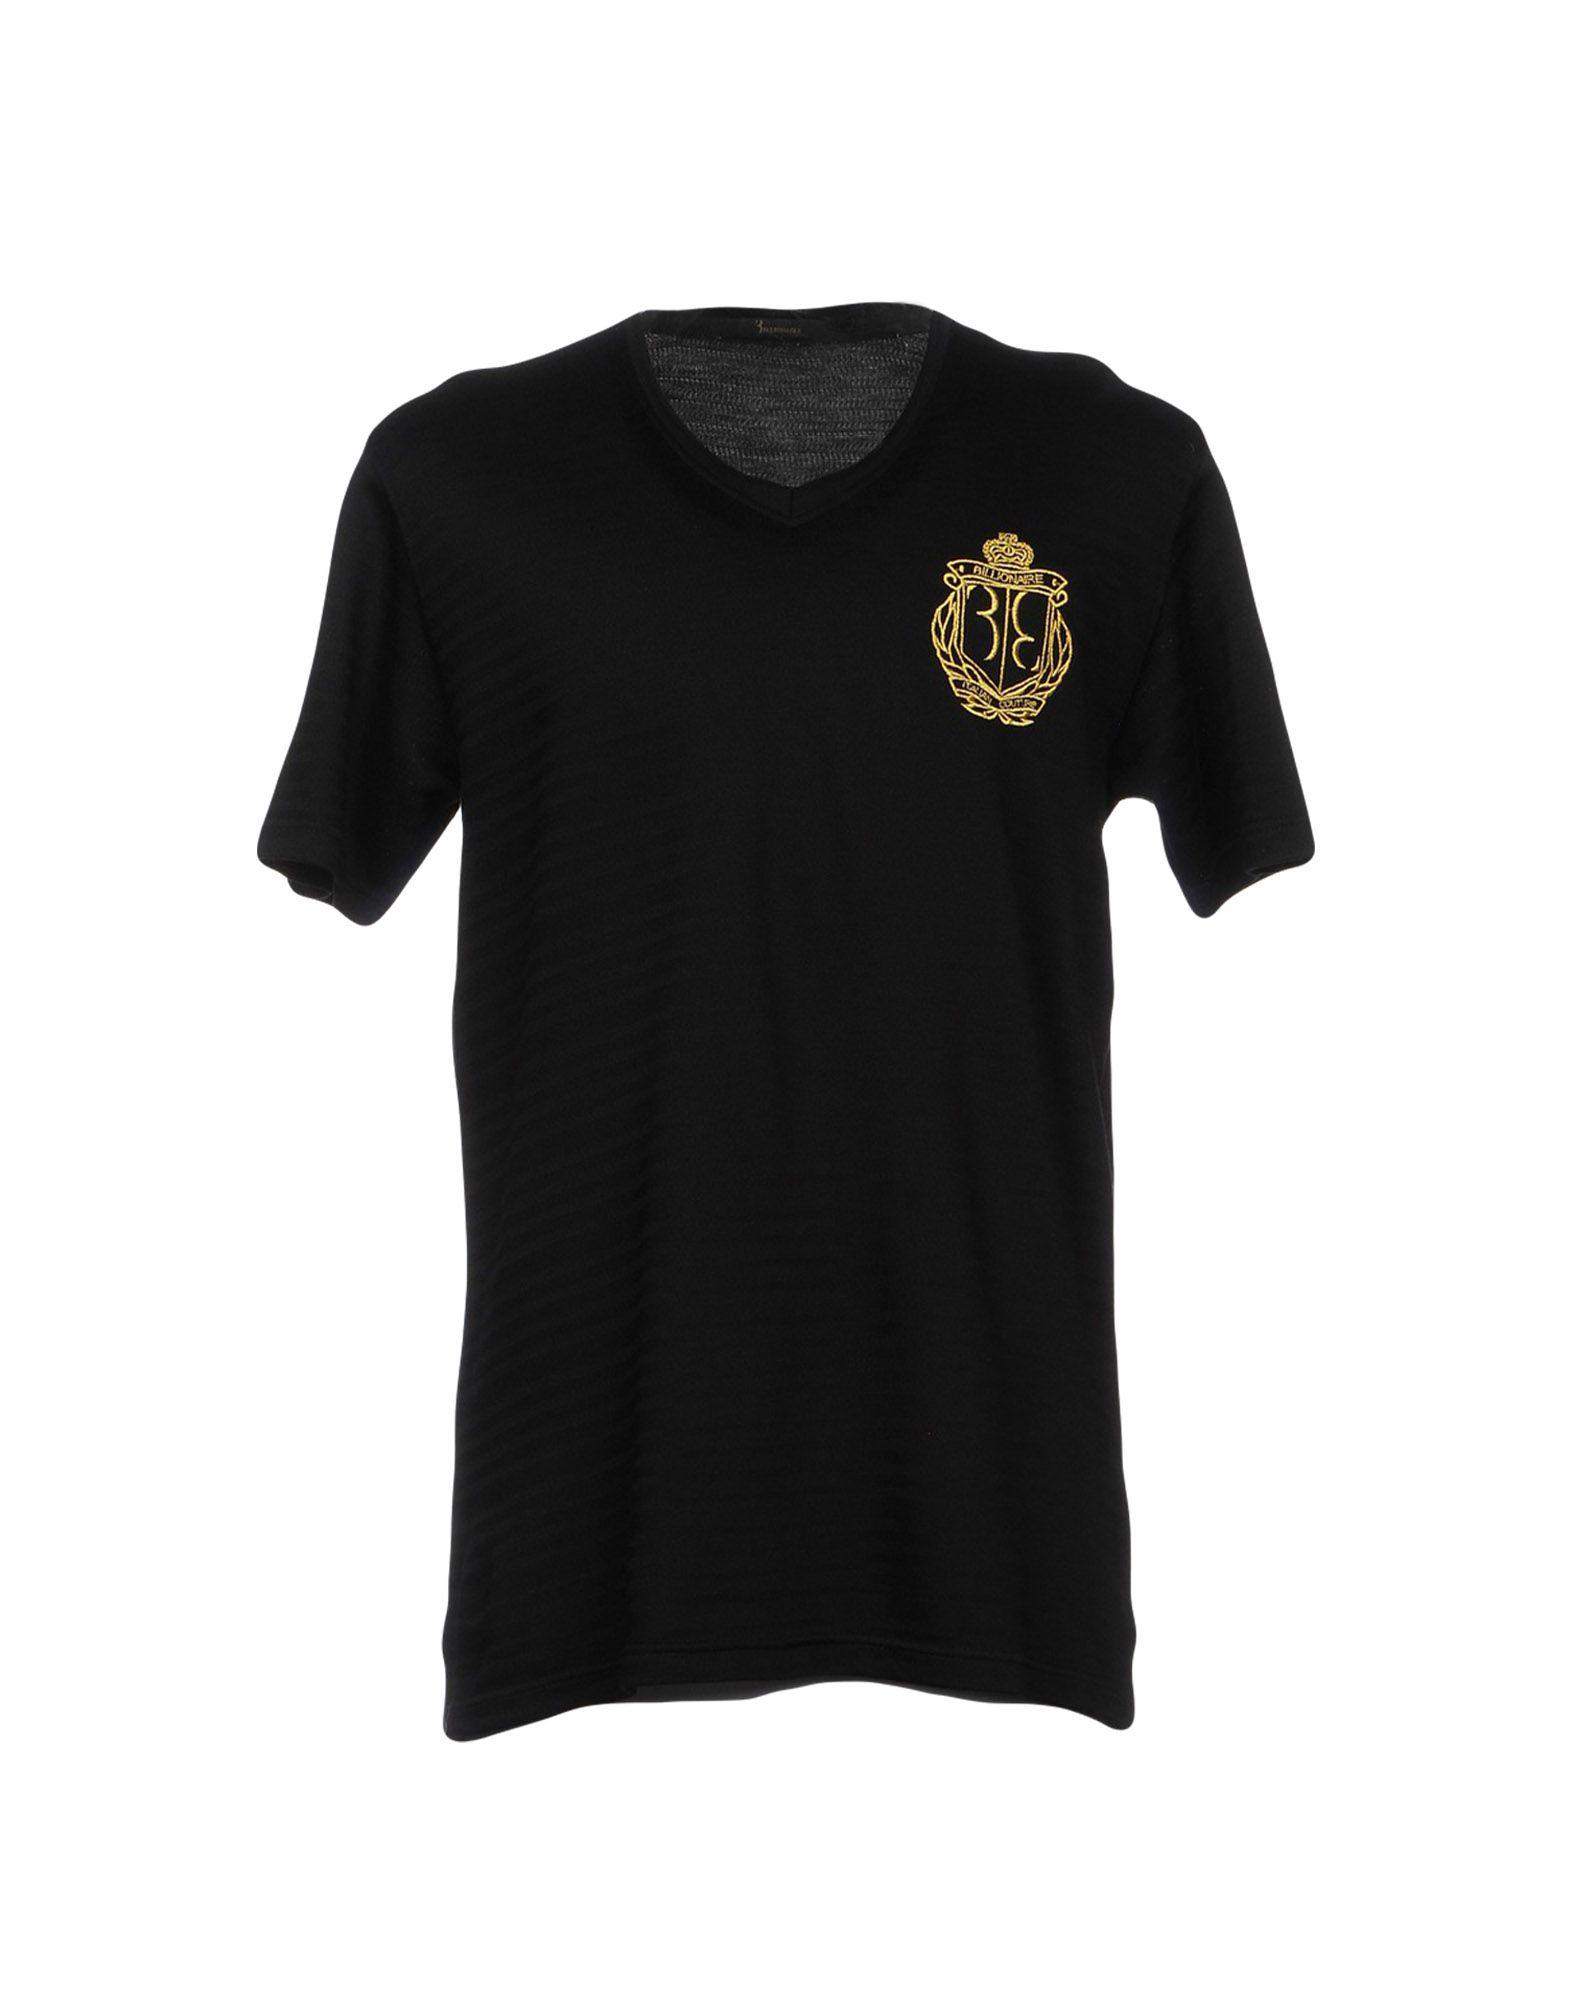 A buon mercato T-Shirt T-Shirt mercato Billionaire Uomo - 12077844GH 687f90